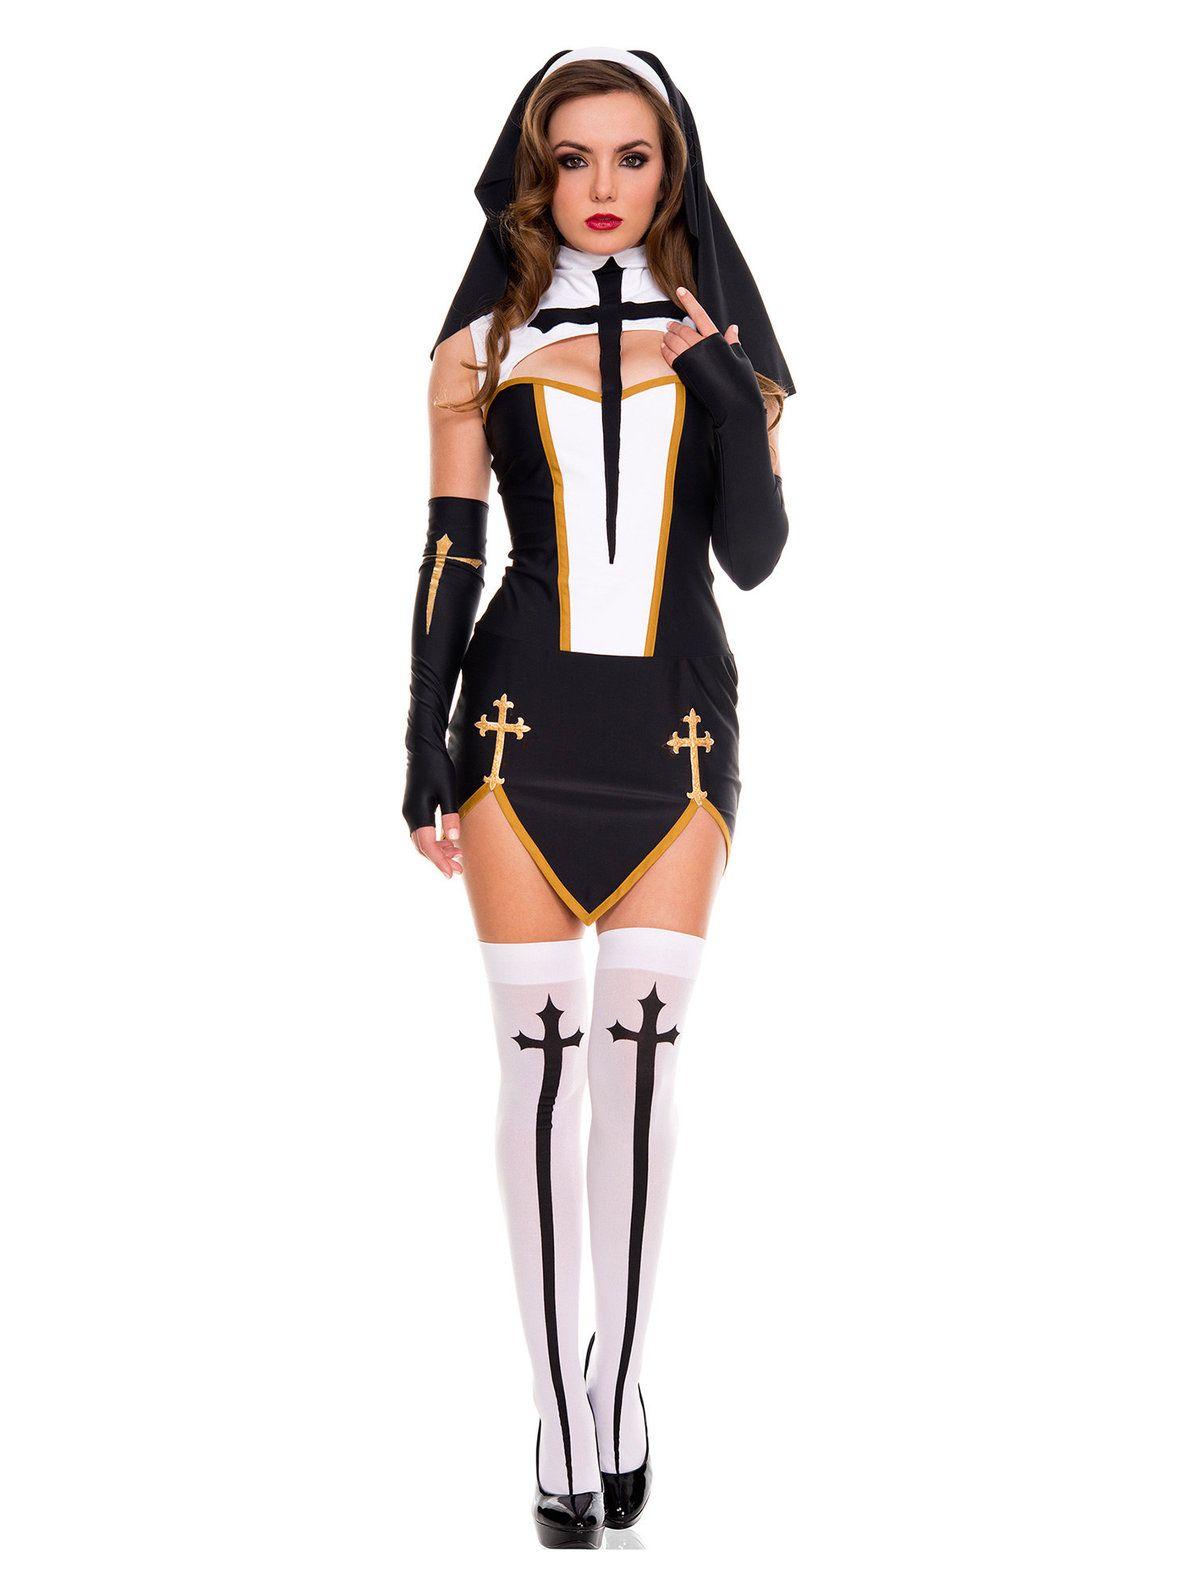 Women's Sexy Bad Habit Nun Costume   Costumes and Halloween costumes